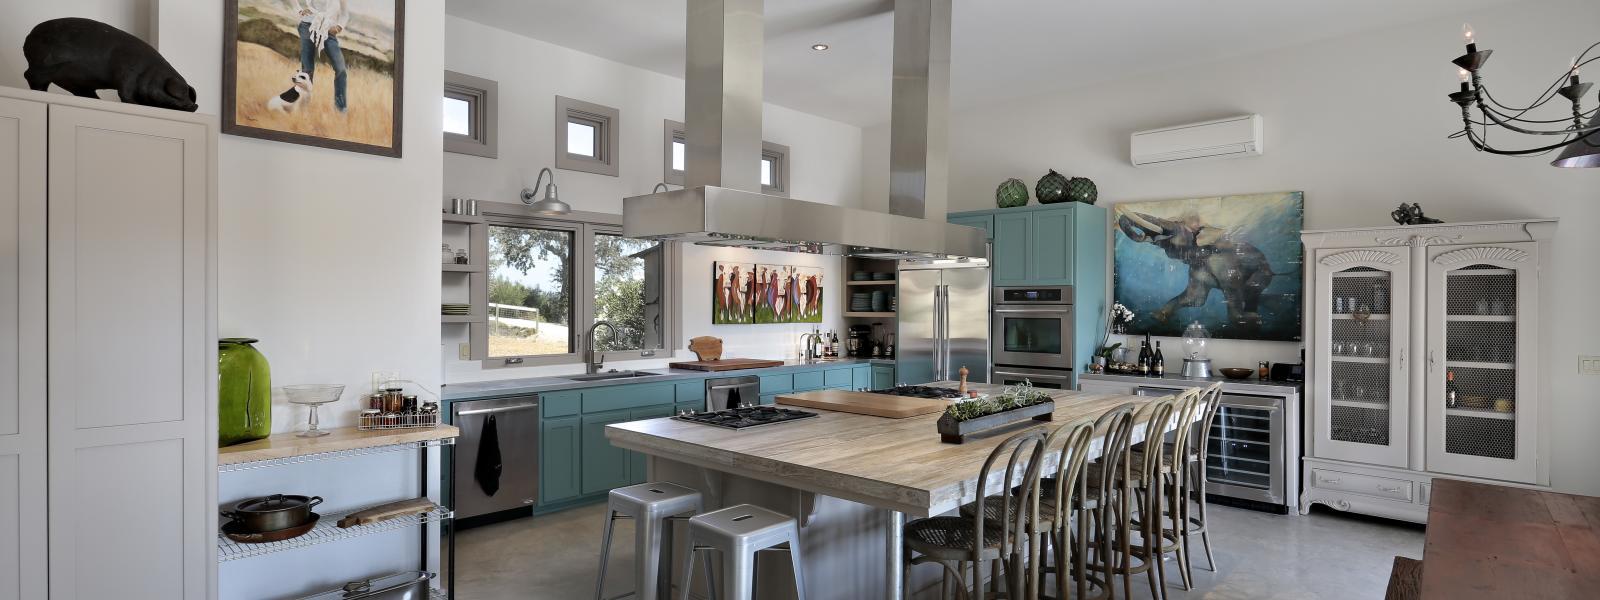 KitchenWidefmLounge